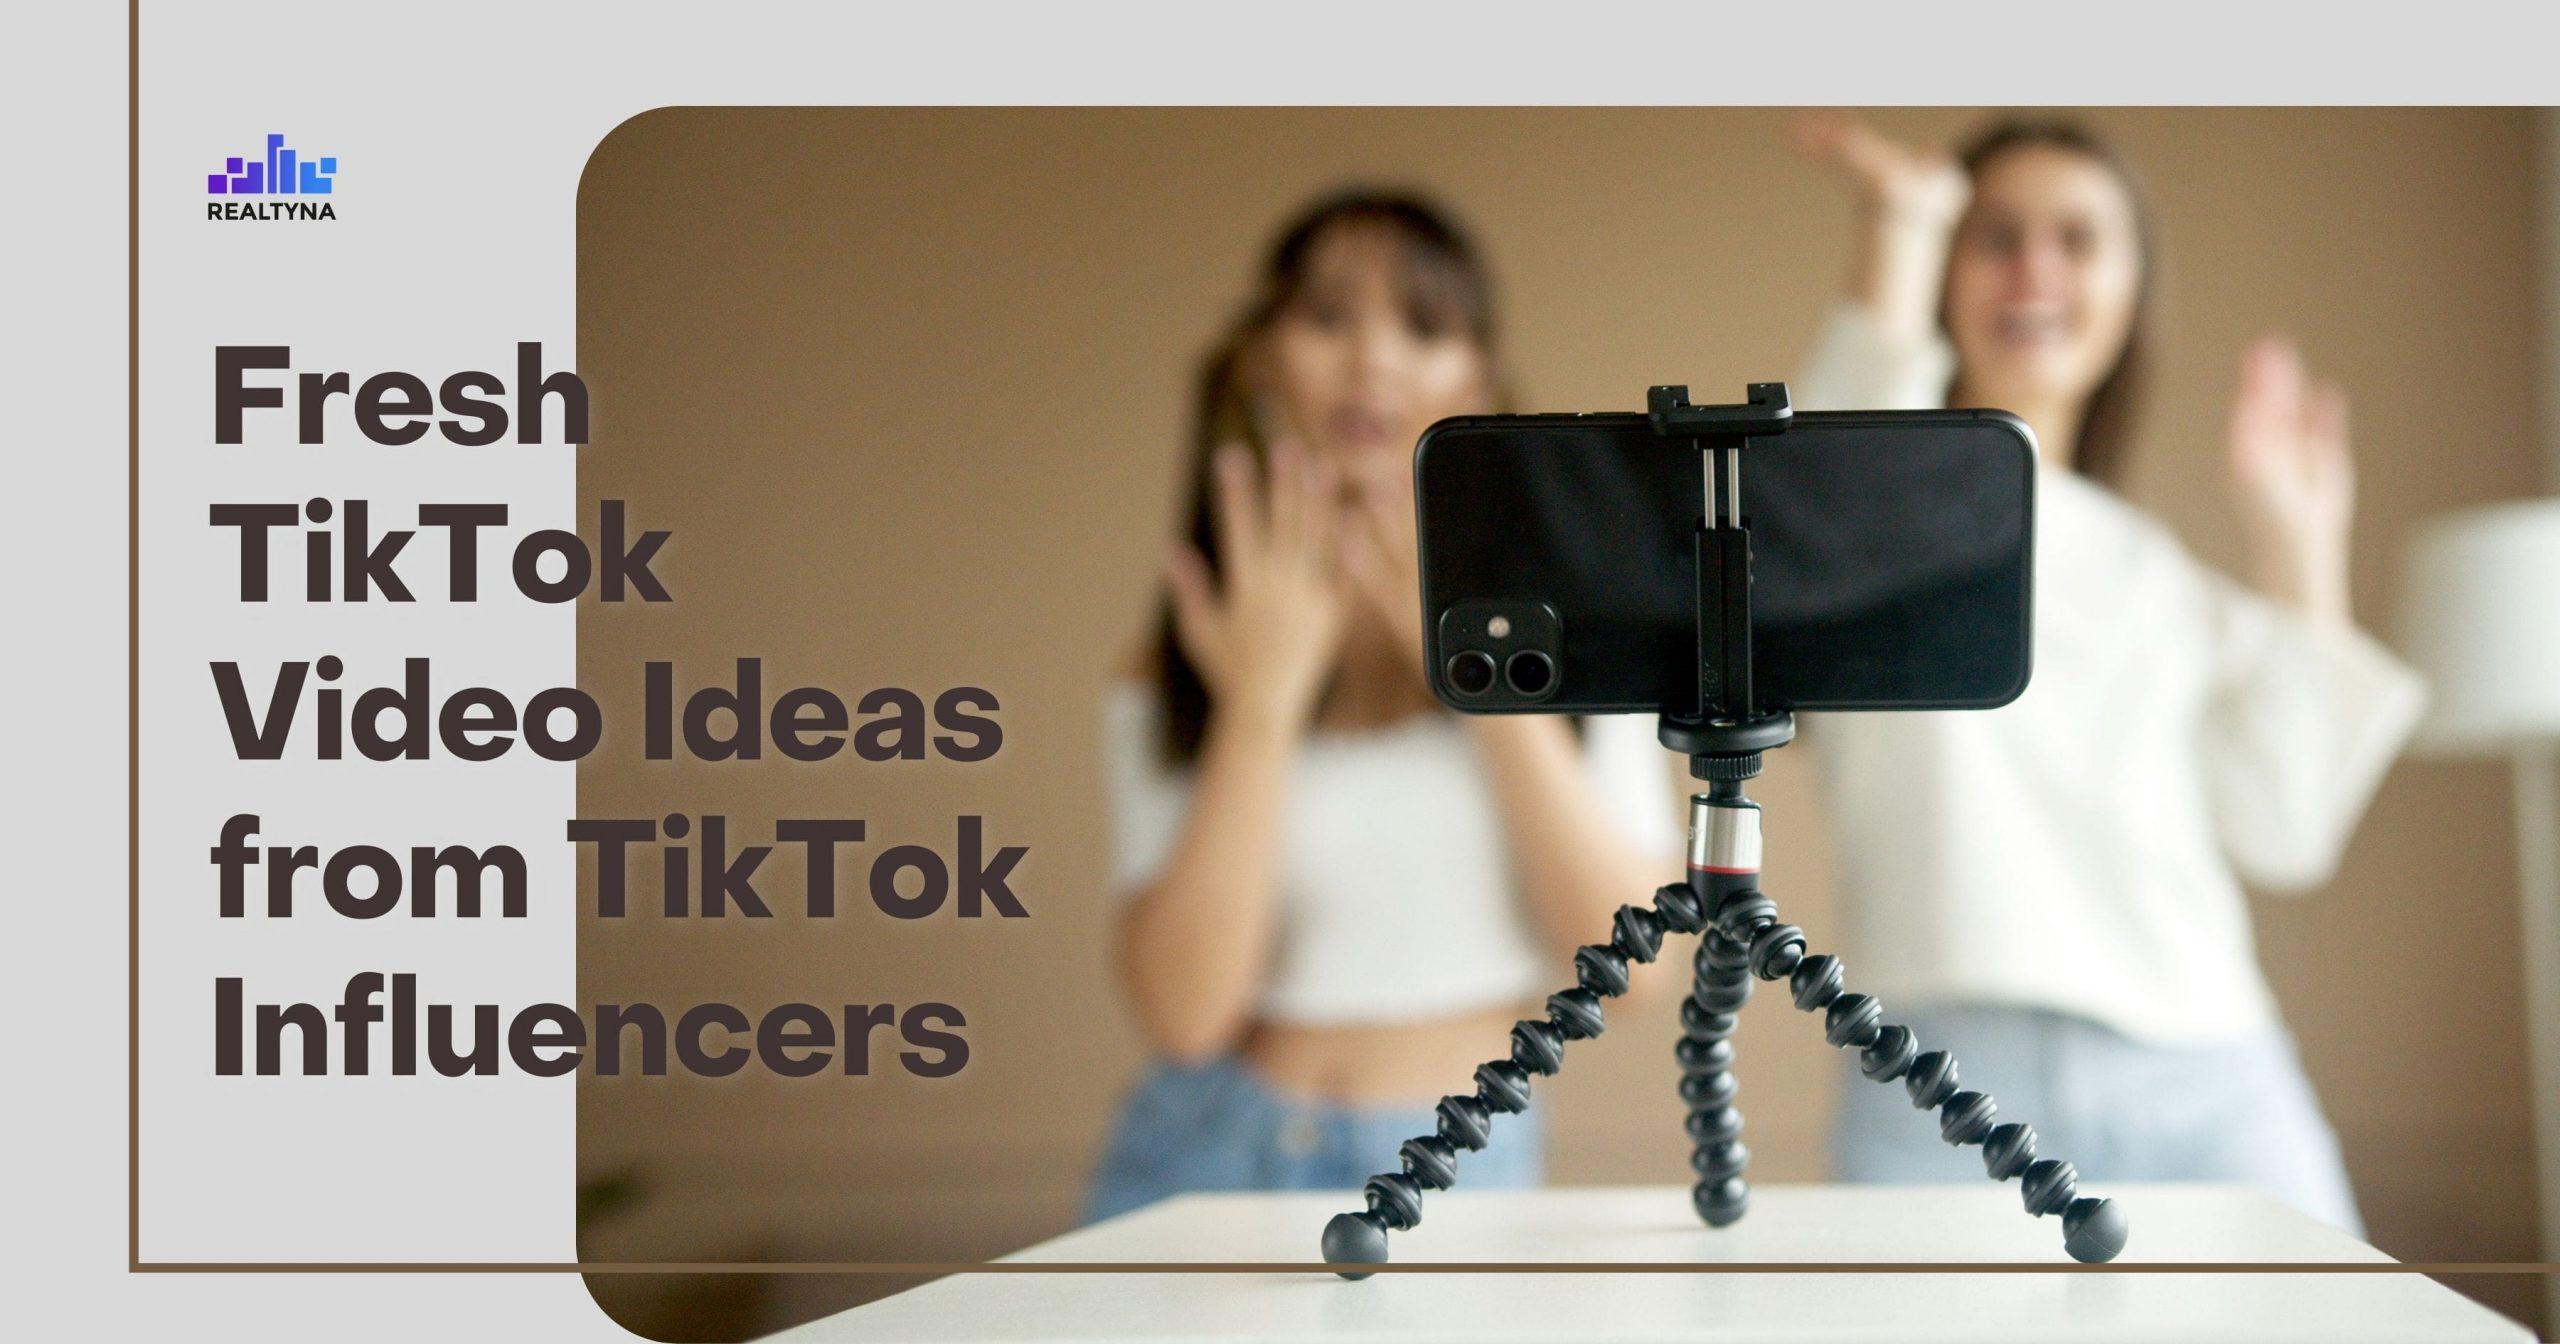 Fresh TikTok Video Ideas from TikTok Influencers